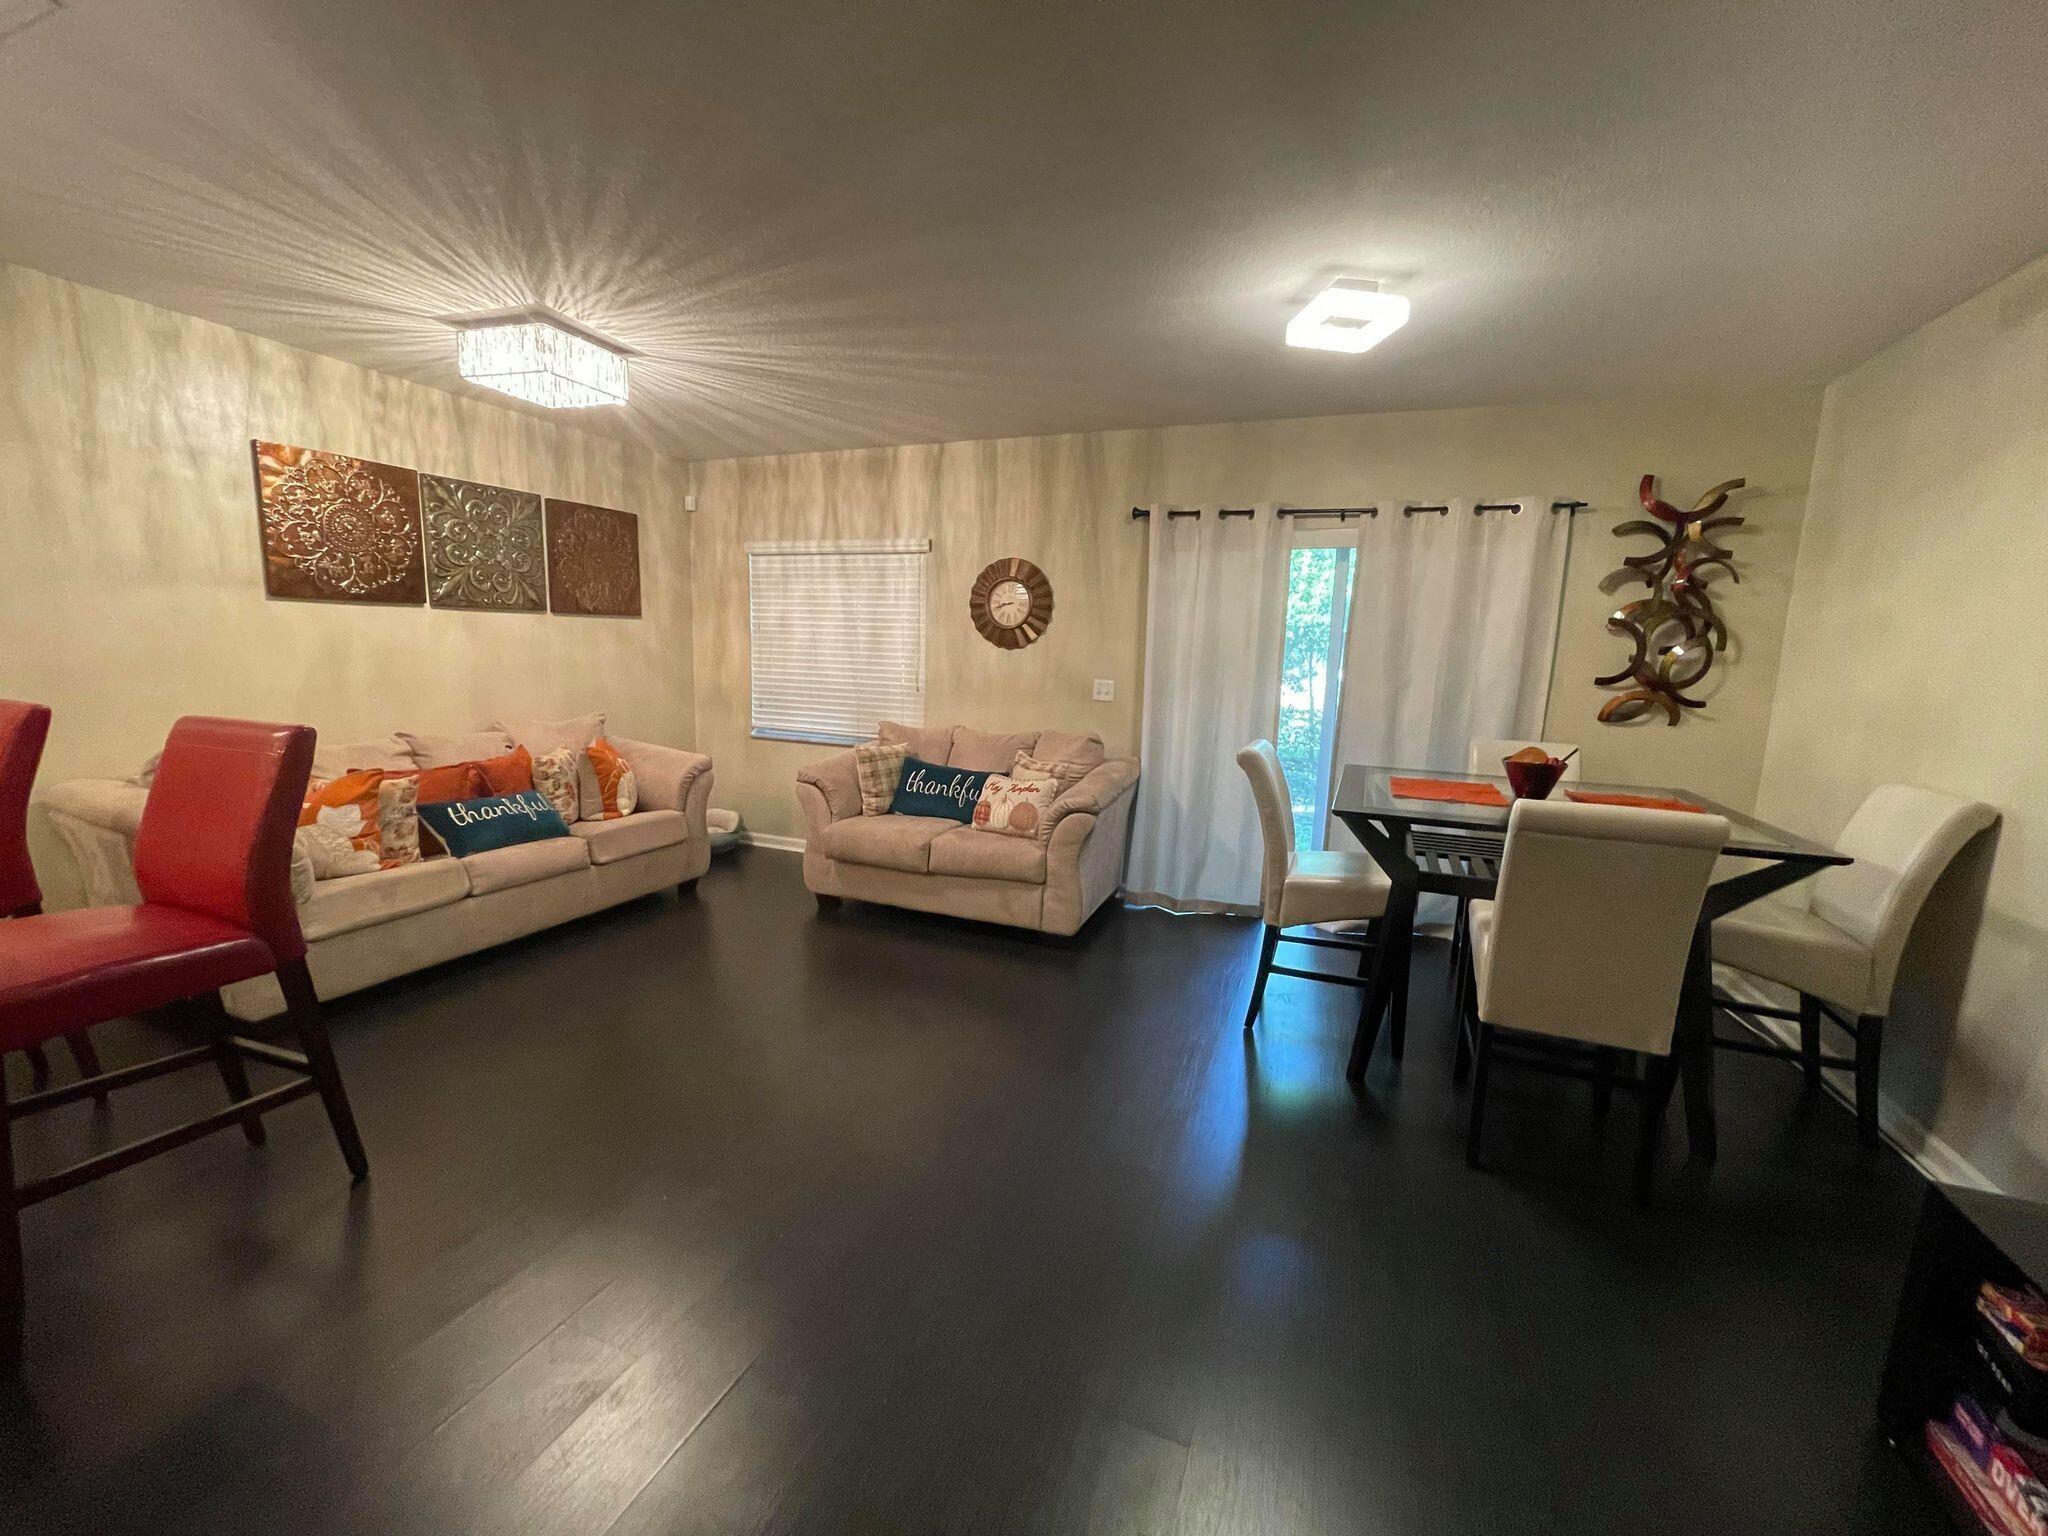 1359 Avon Lane, North Lauderdale, Florida 33068, 3 Bedrooms Bedrooms, ,2 BathroomsBathrooms,Residential,For Sale,Avon,RX-10746187